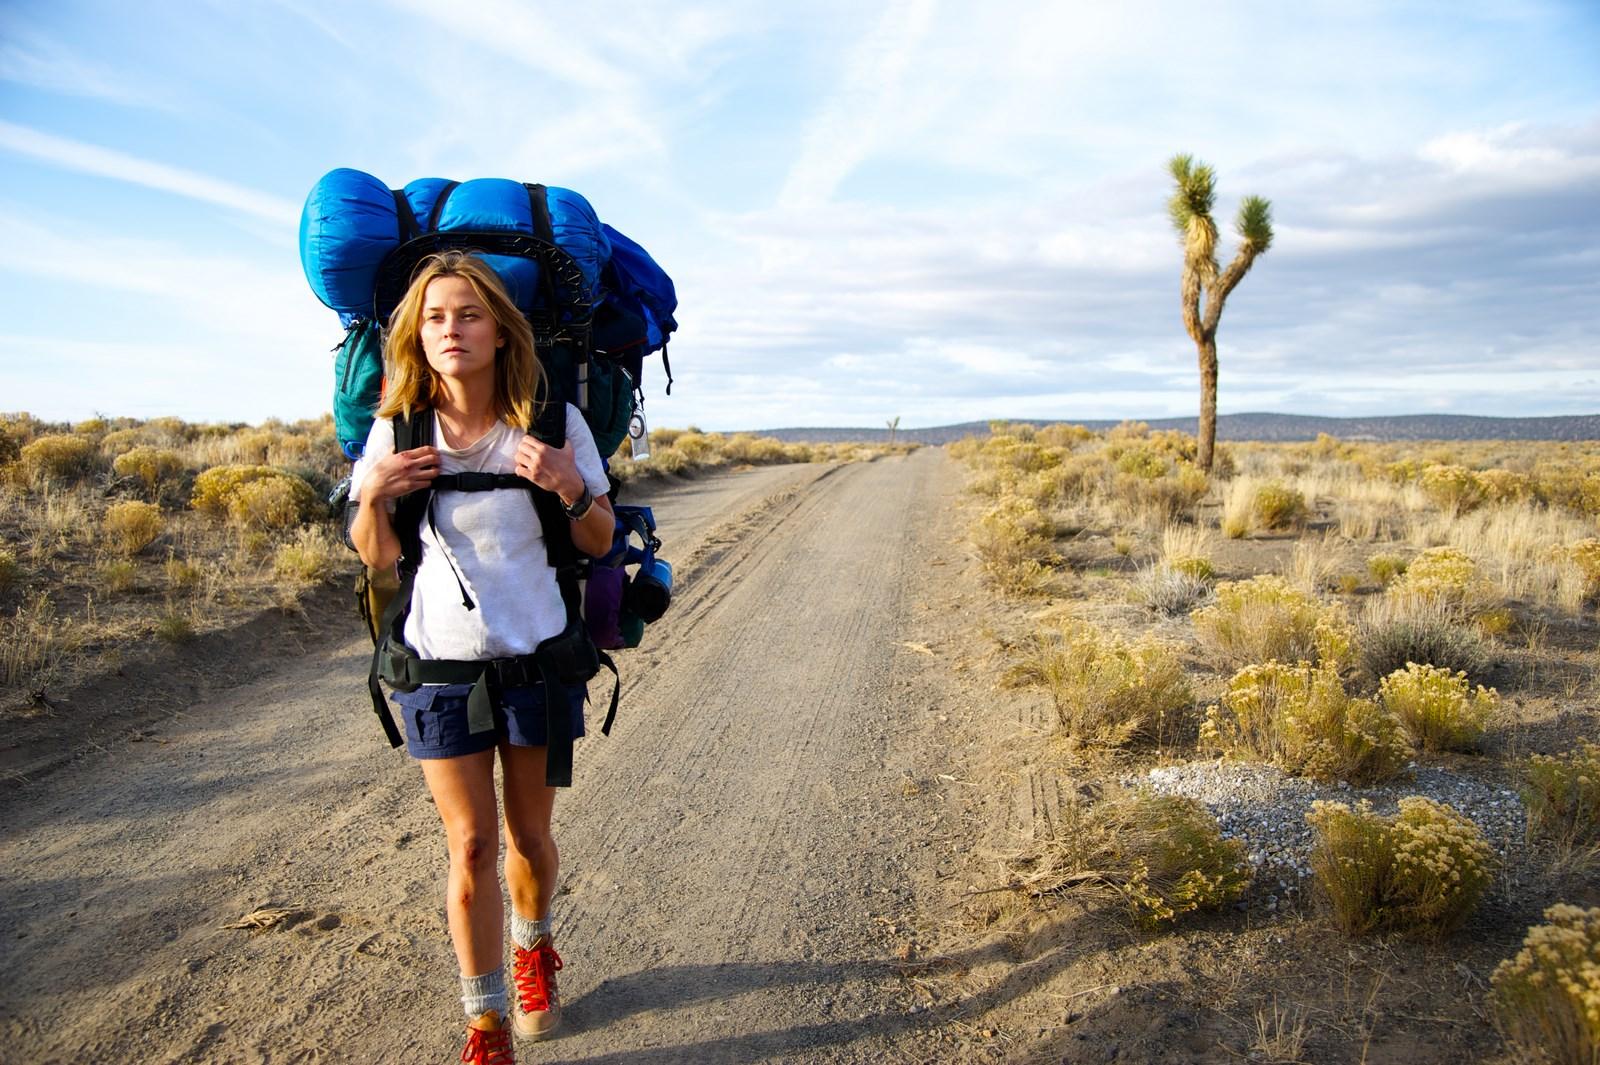 voyage aventure